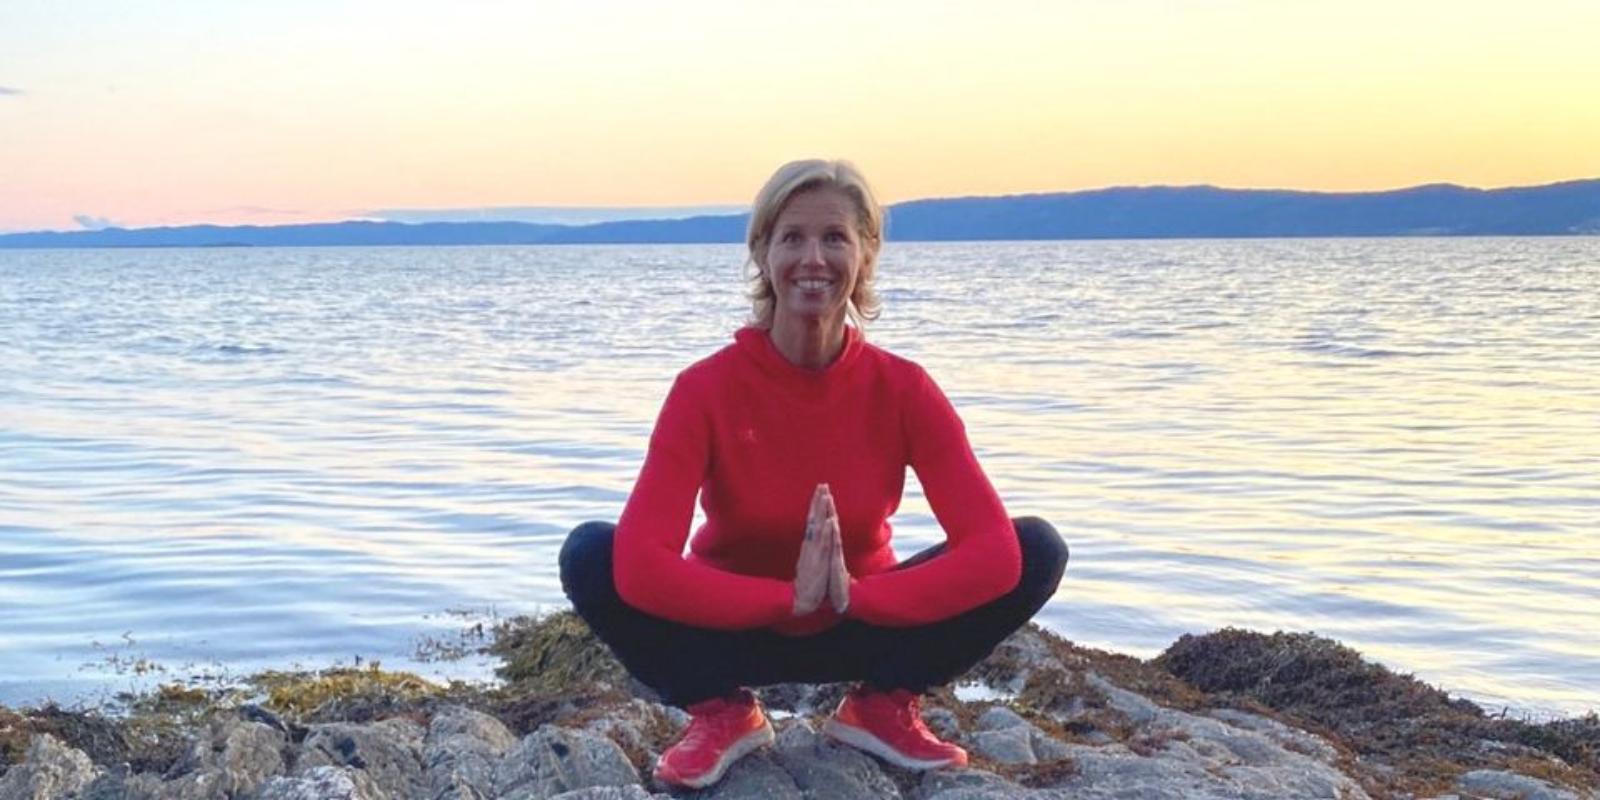 Merethe Grønbech Yoga